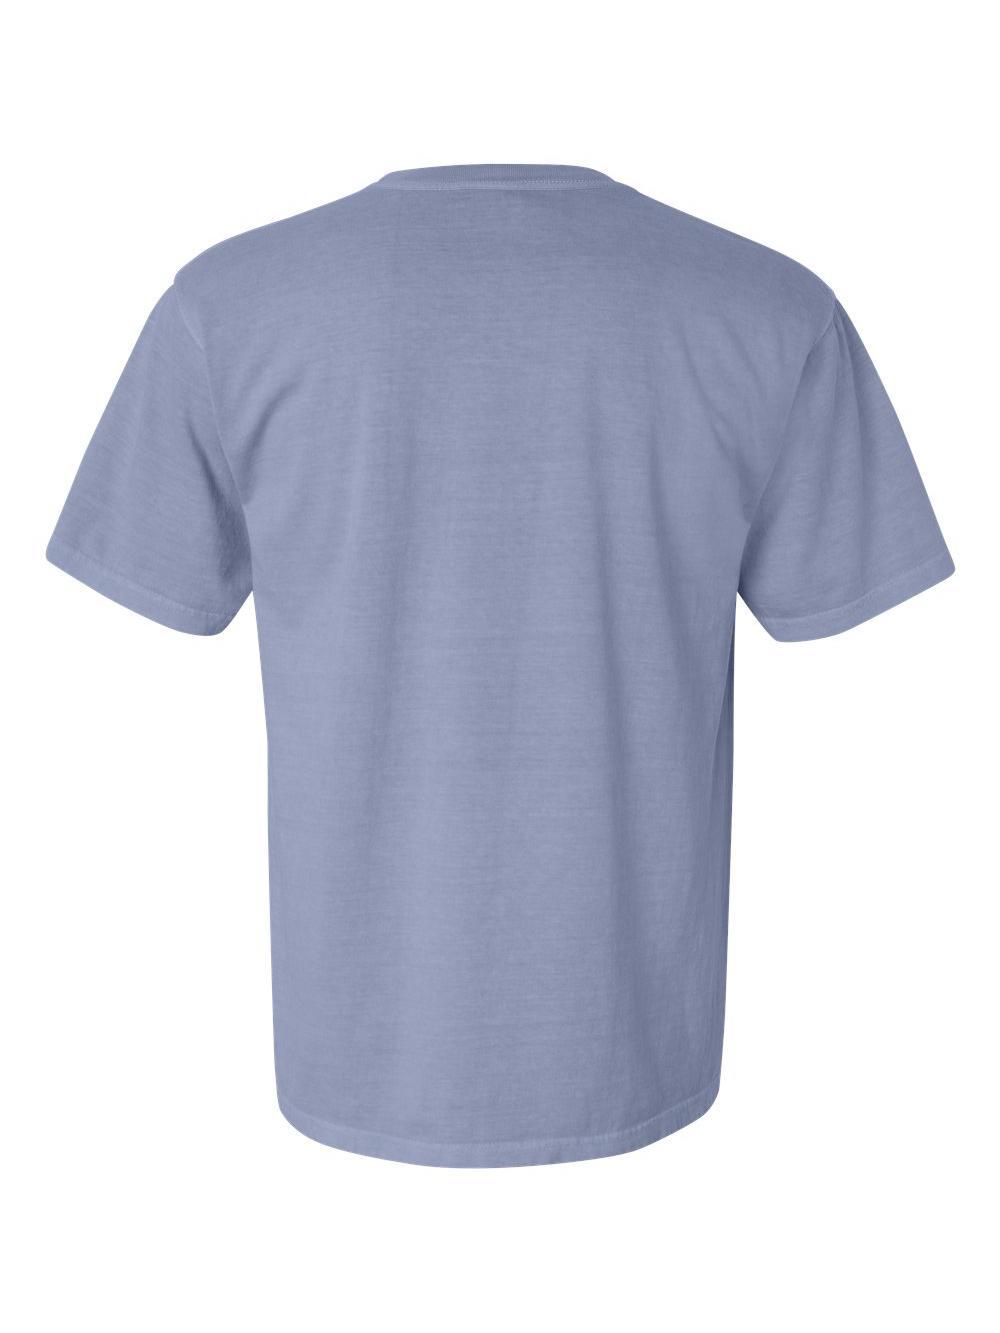 Comfort-Colors-Garment-Dyed-Heavyweight-Ringspun-Short-Sleeve-Shirt-1717 thumbnail 67